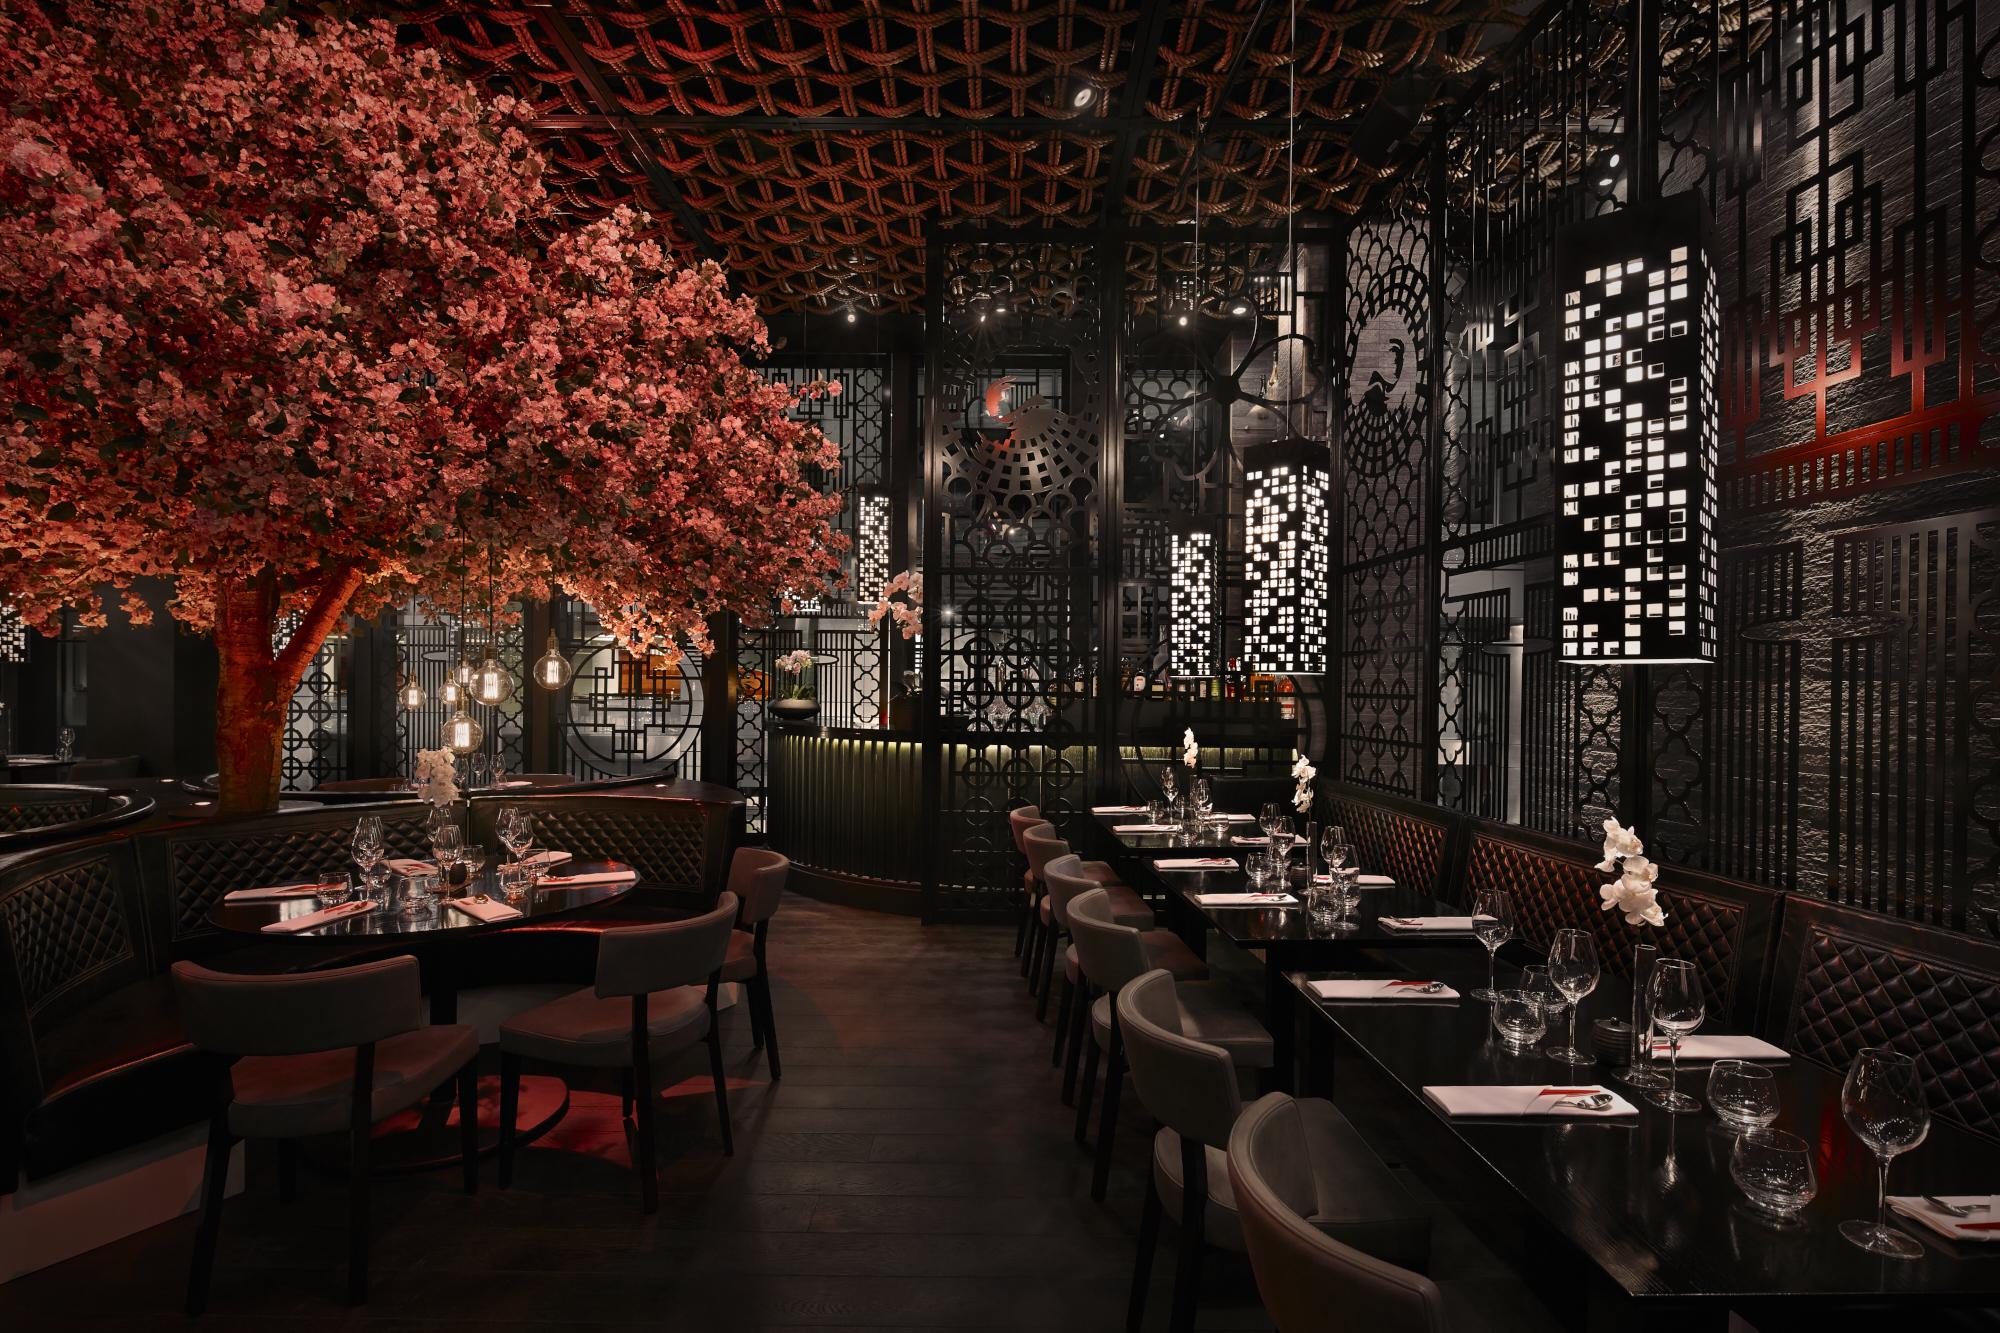 2016 Restaurant Bar Design Awards Announced ArchDaily